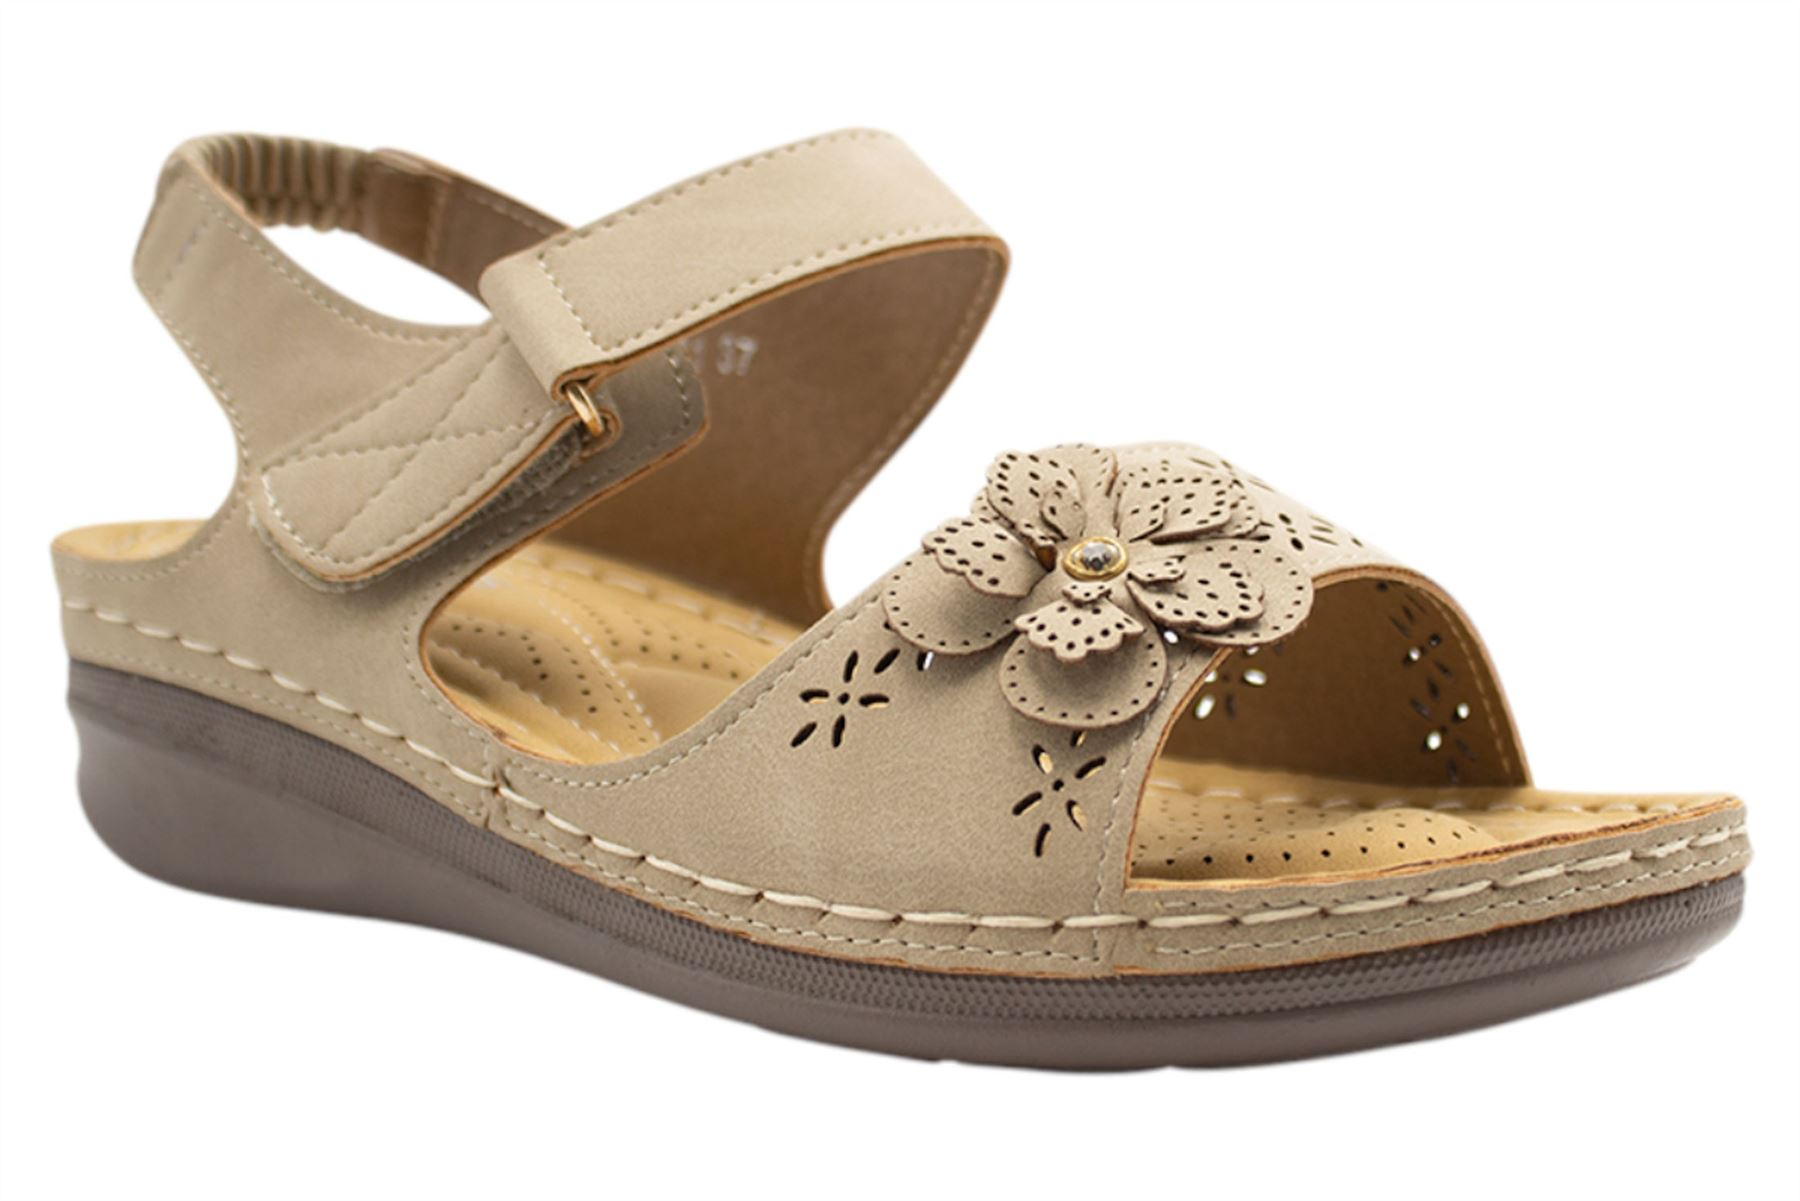 Ladies-Sandals-Womens-Mid-Heel-Comfort-Summer-Beach-Casual-Wear miniatura 11